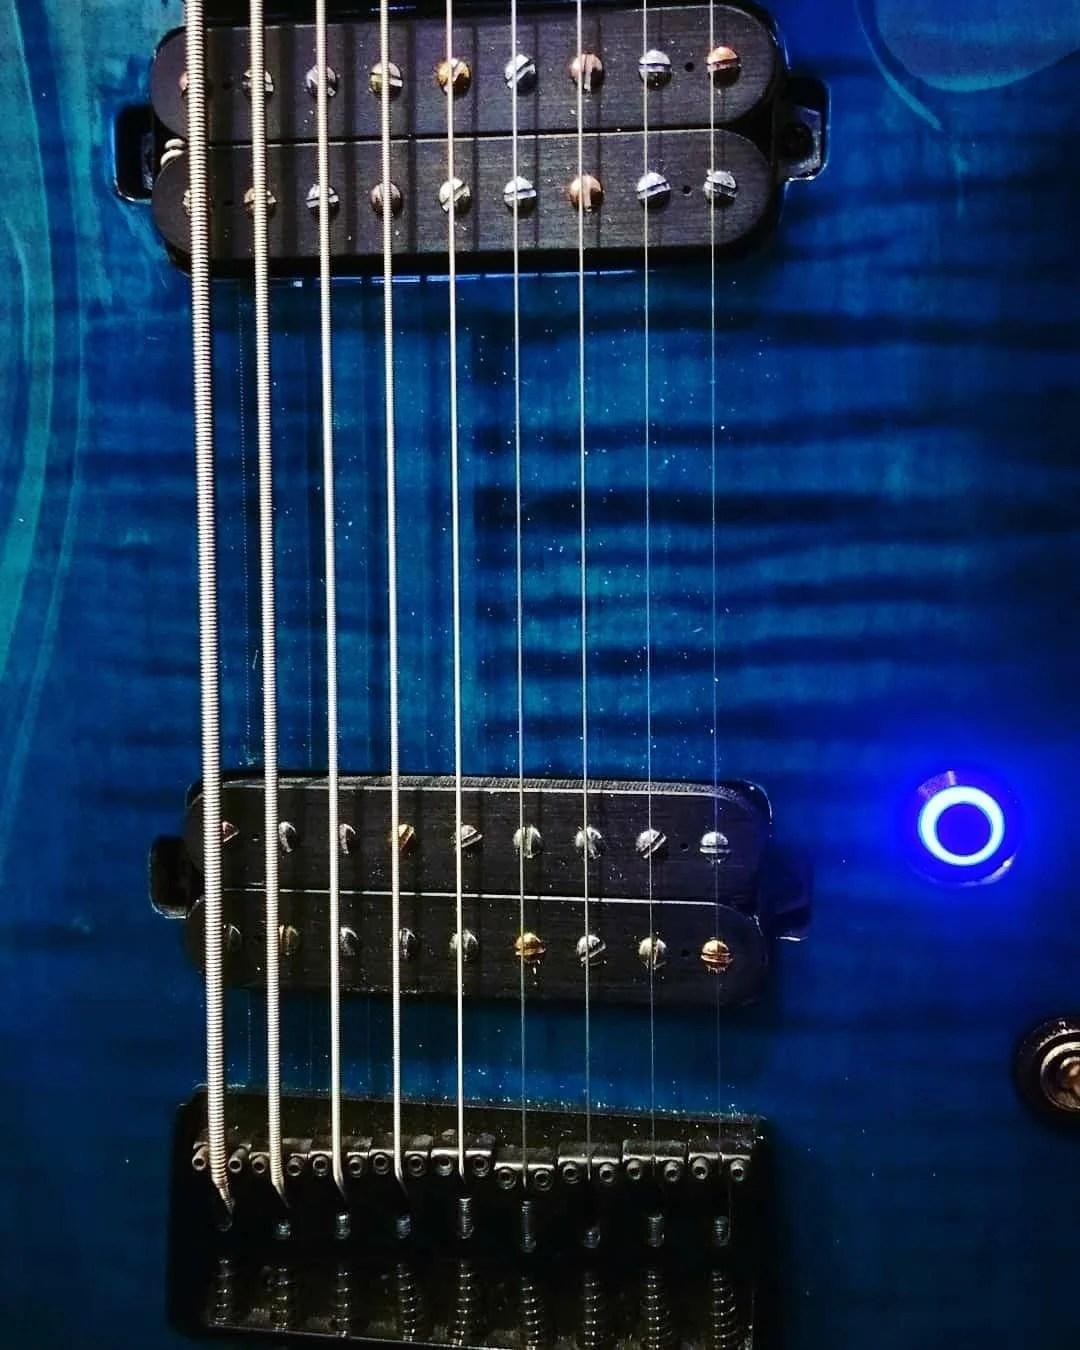 black stealth led guitar killswitch [ 1080 x 1350 Pixel ]